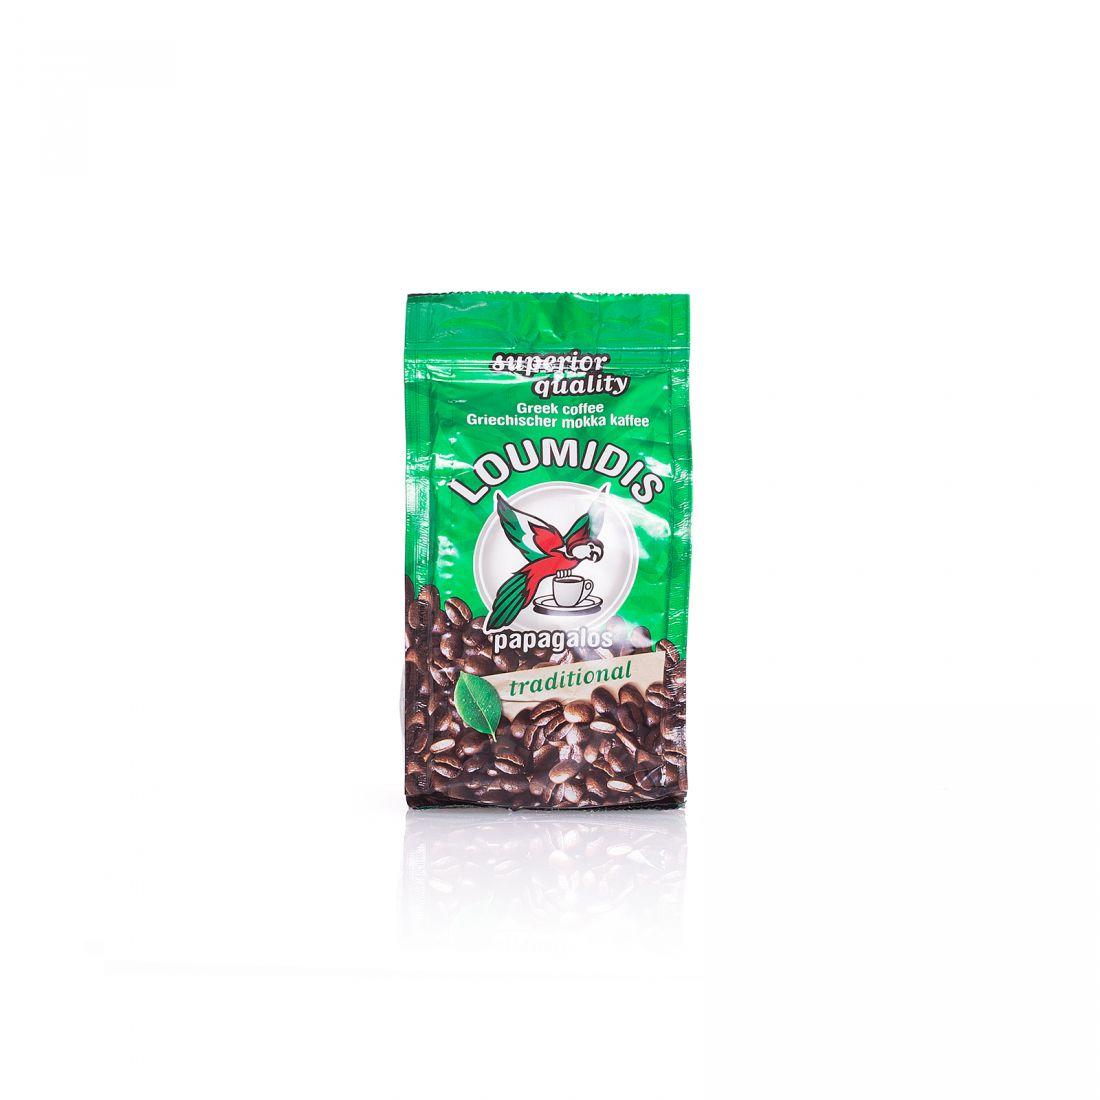 Кофе натуральный молотый Loumidis Papagalos - 96 гр